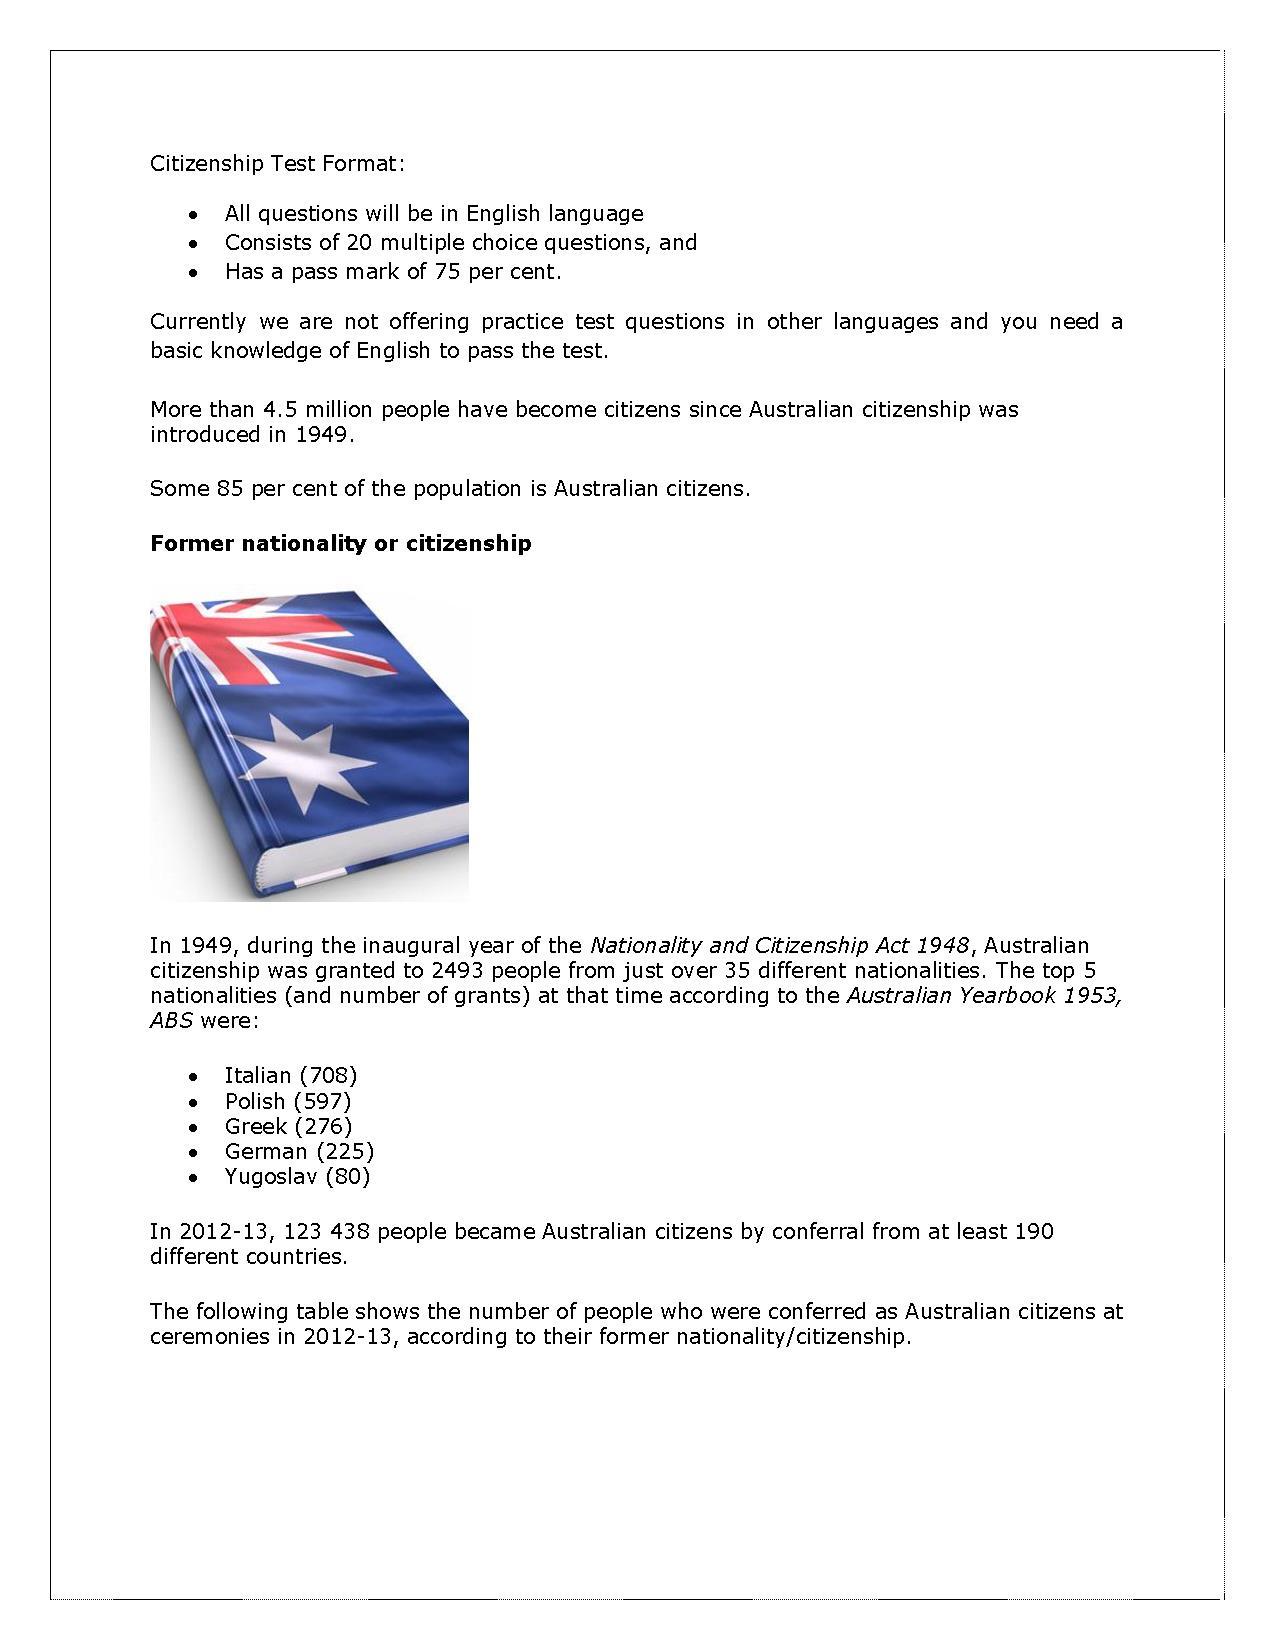 Australian Citizenship Practice Test Online - New Website PowerPoint